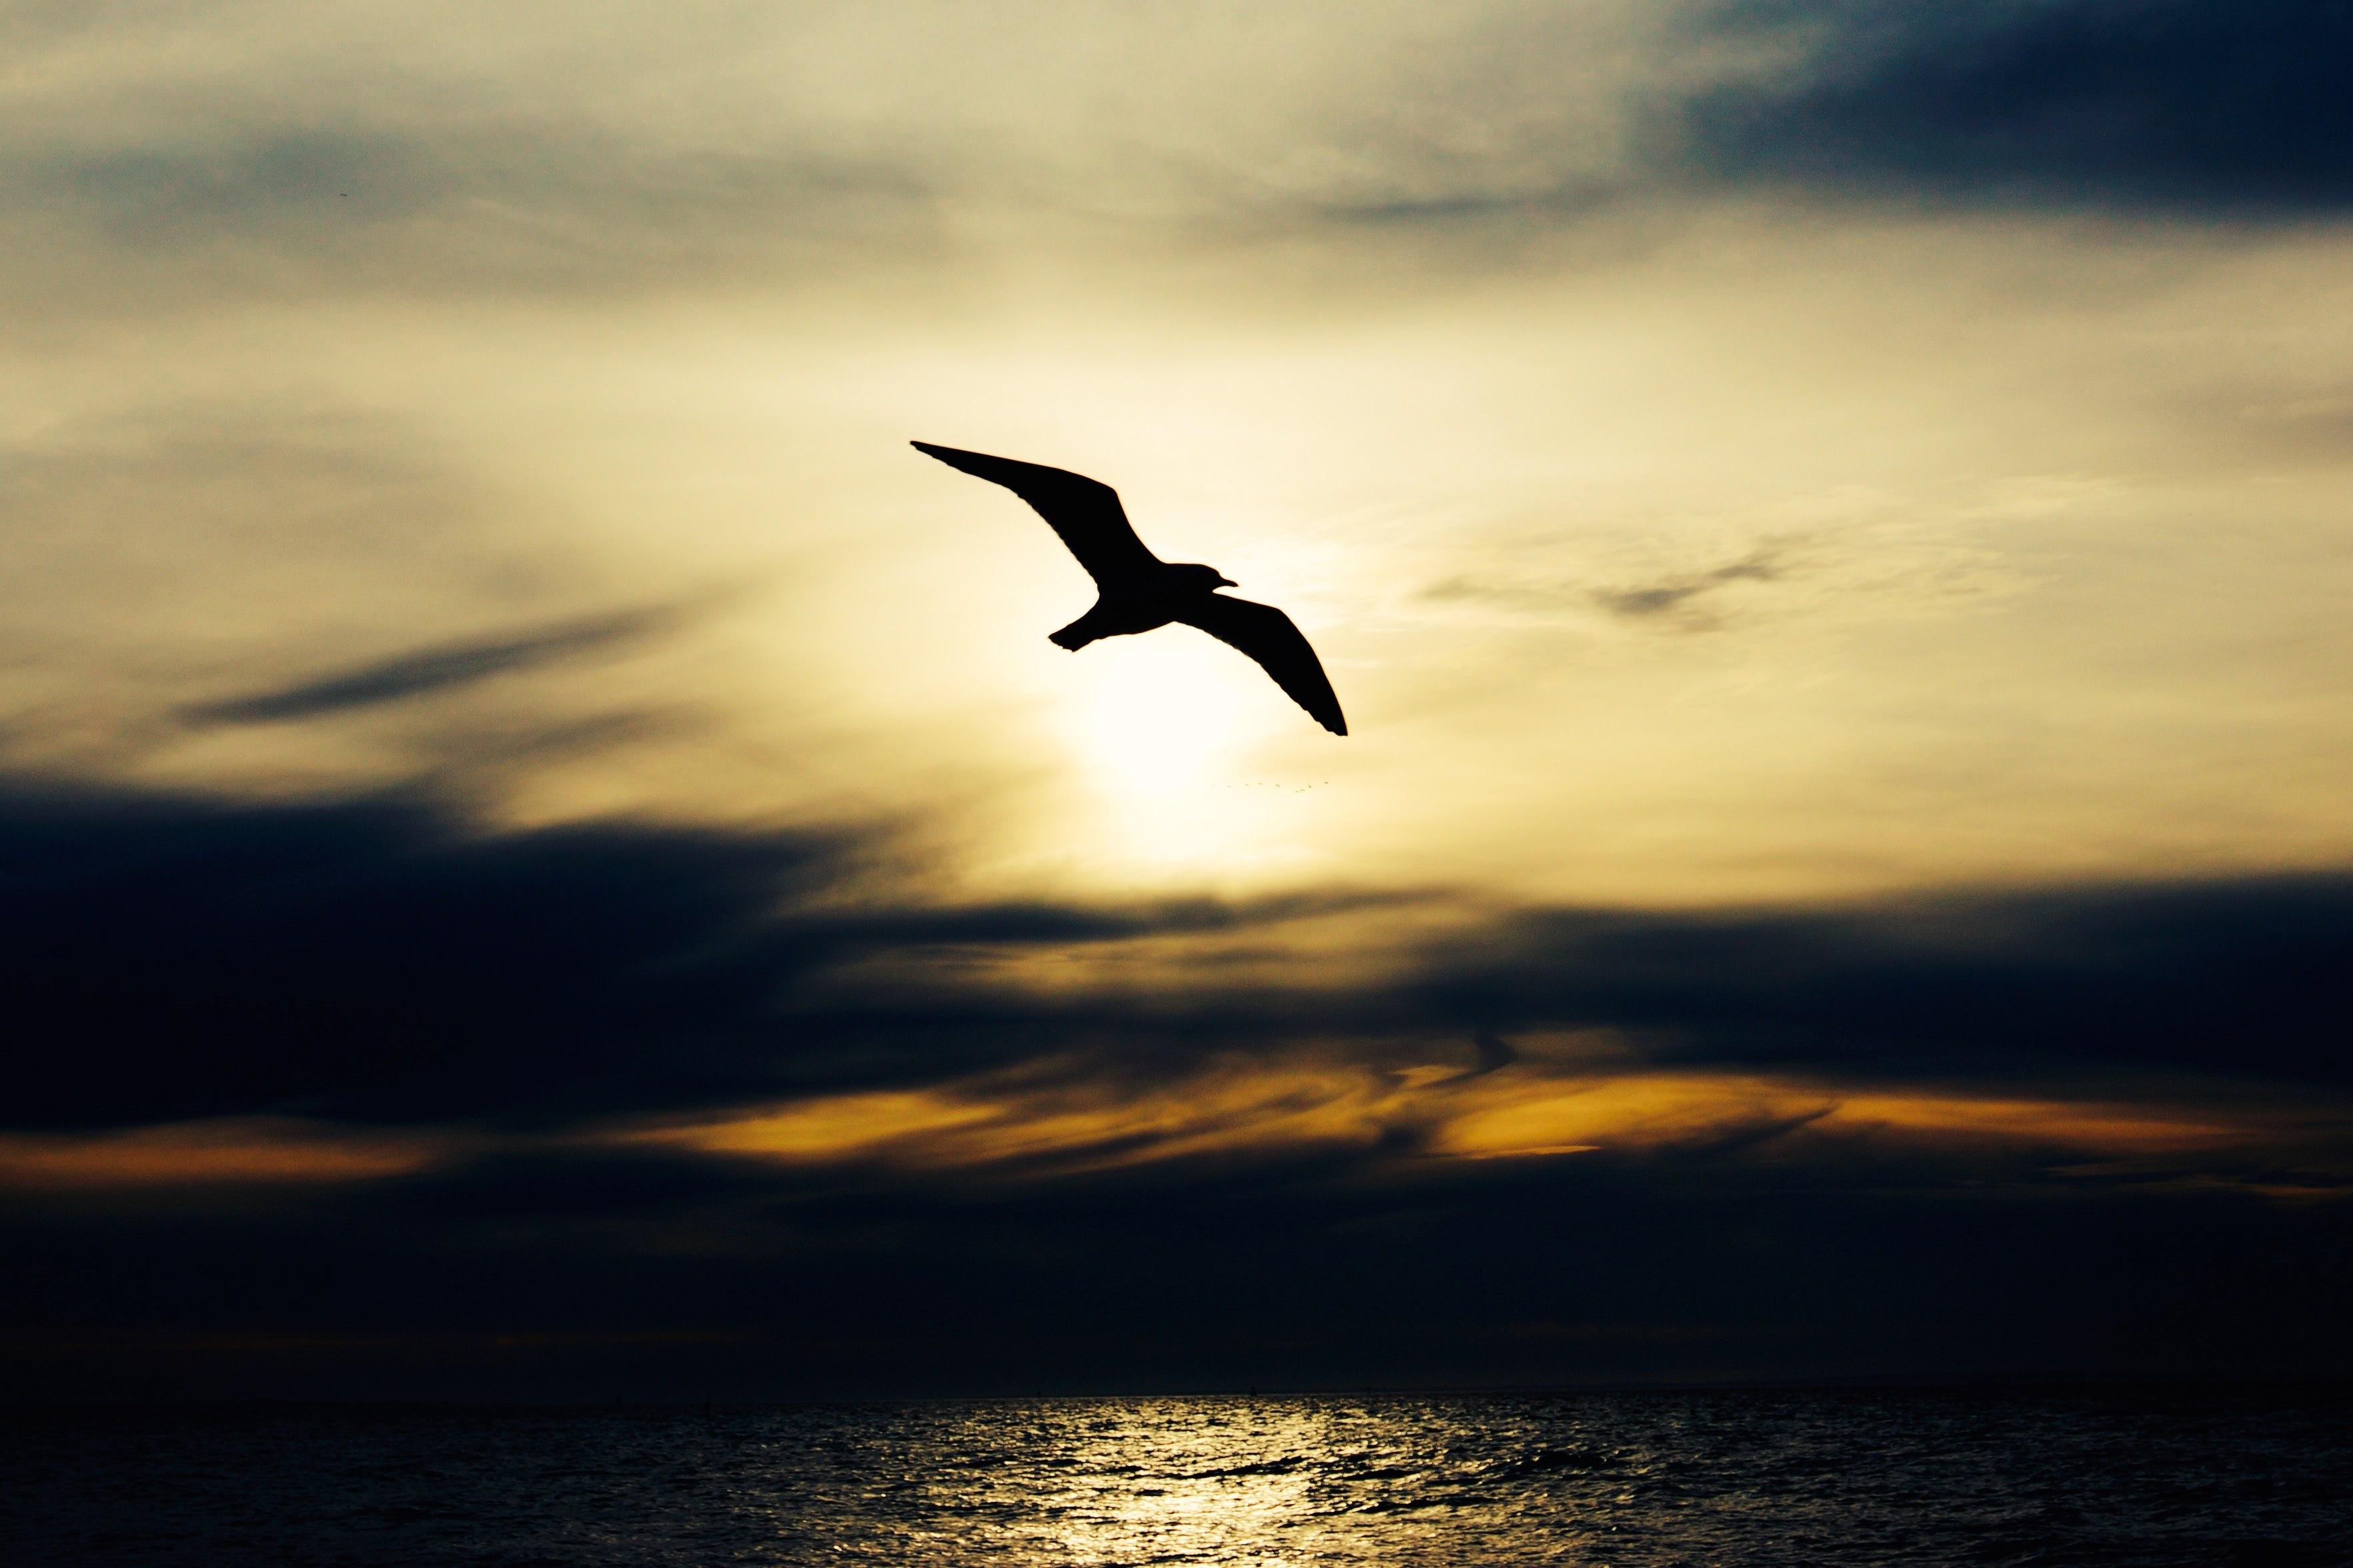 a bird flying over the ocean